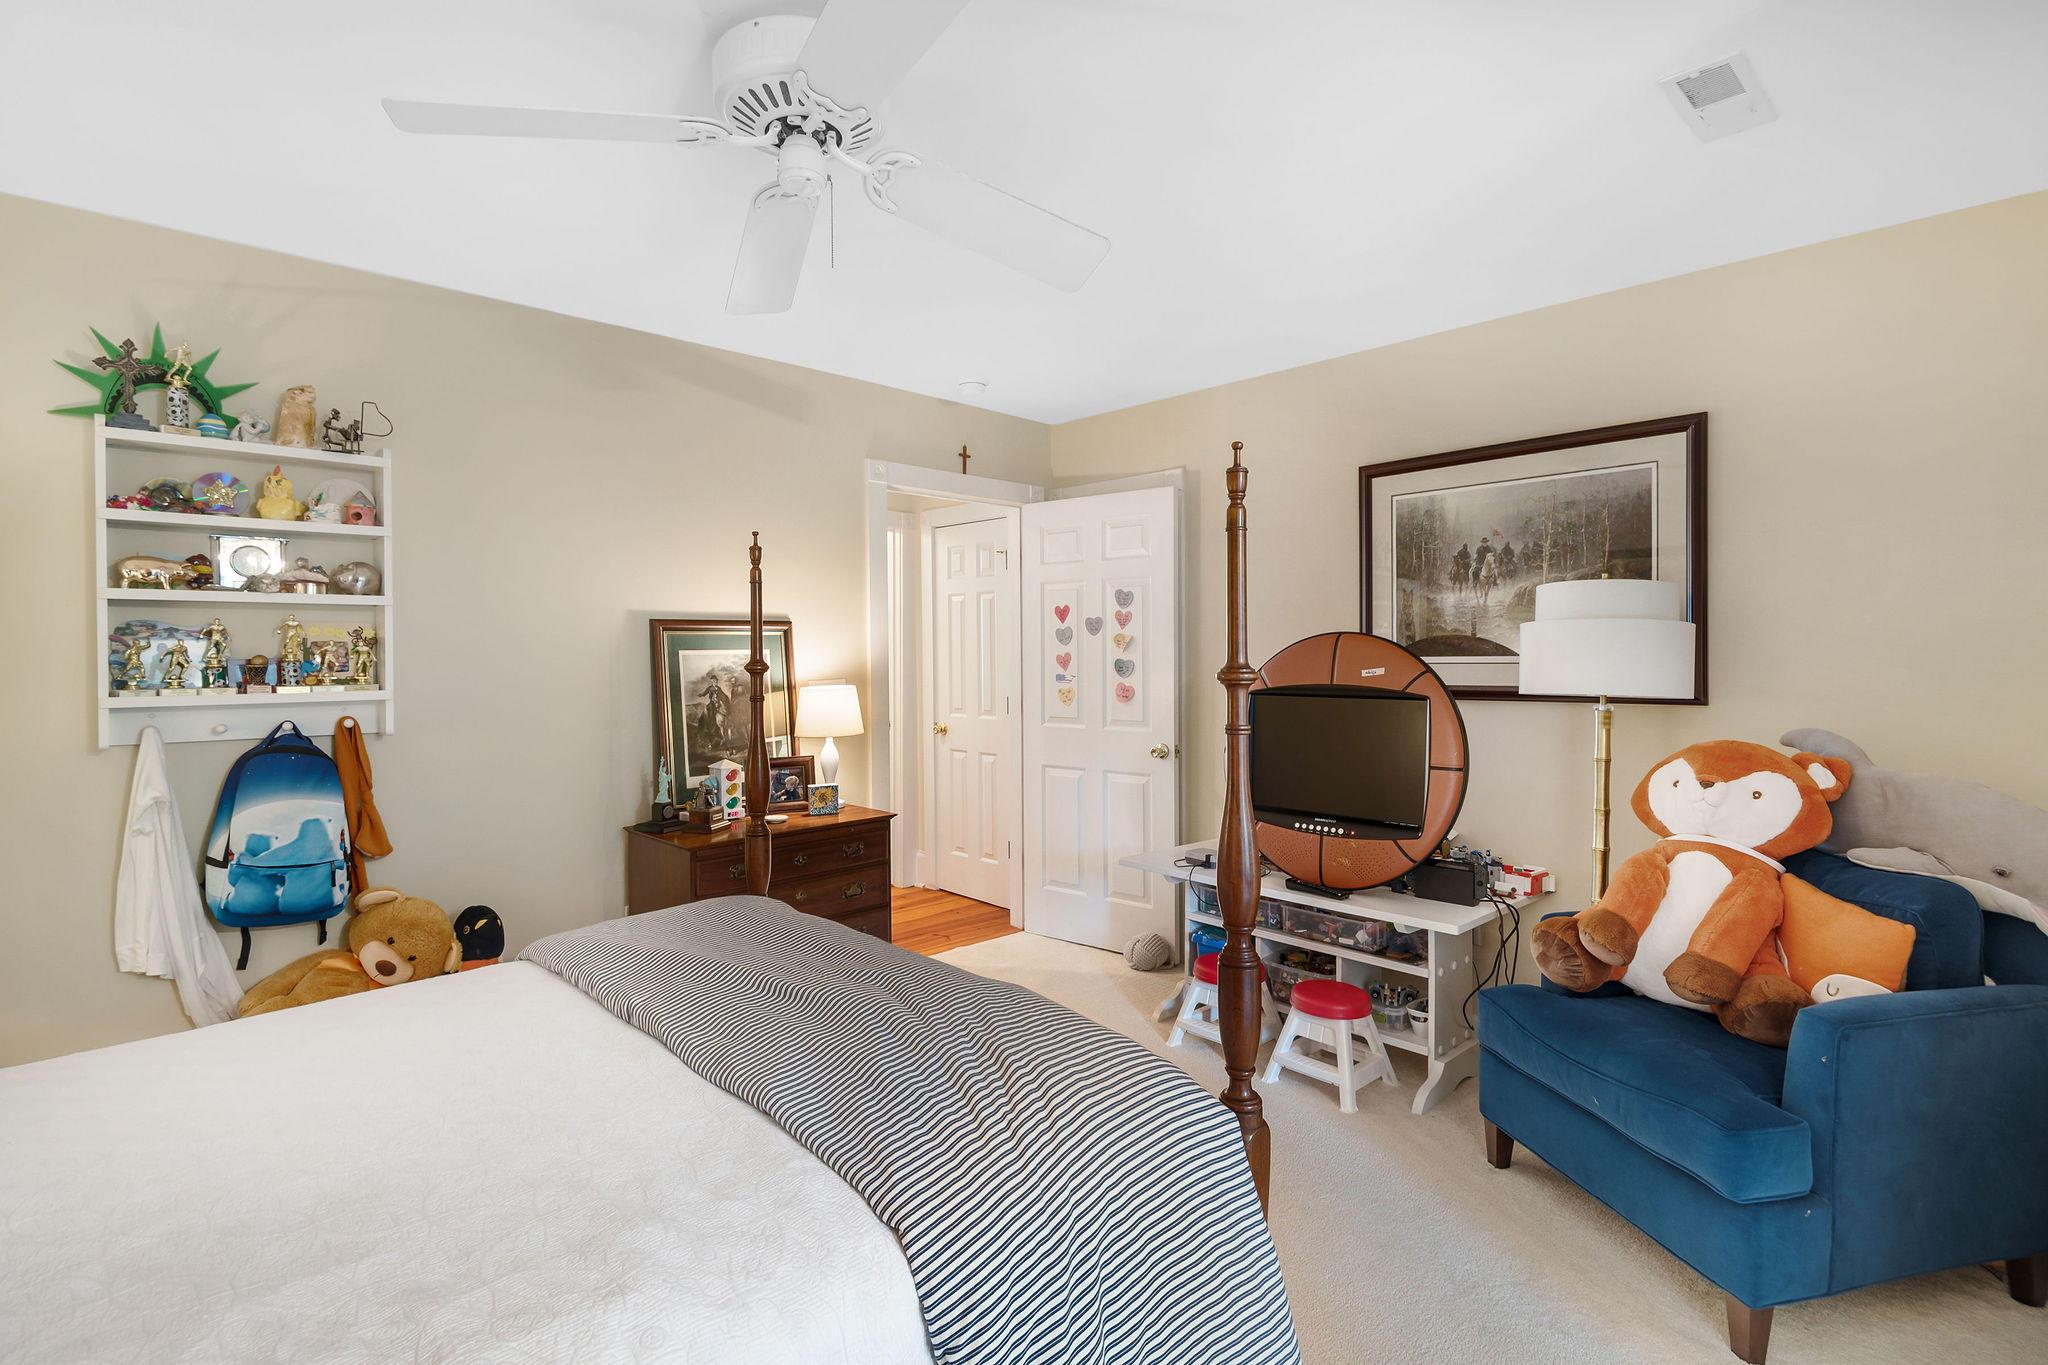 Country Club II Homes For Sale - 1482 Burningtree, Charleston, SC - 27